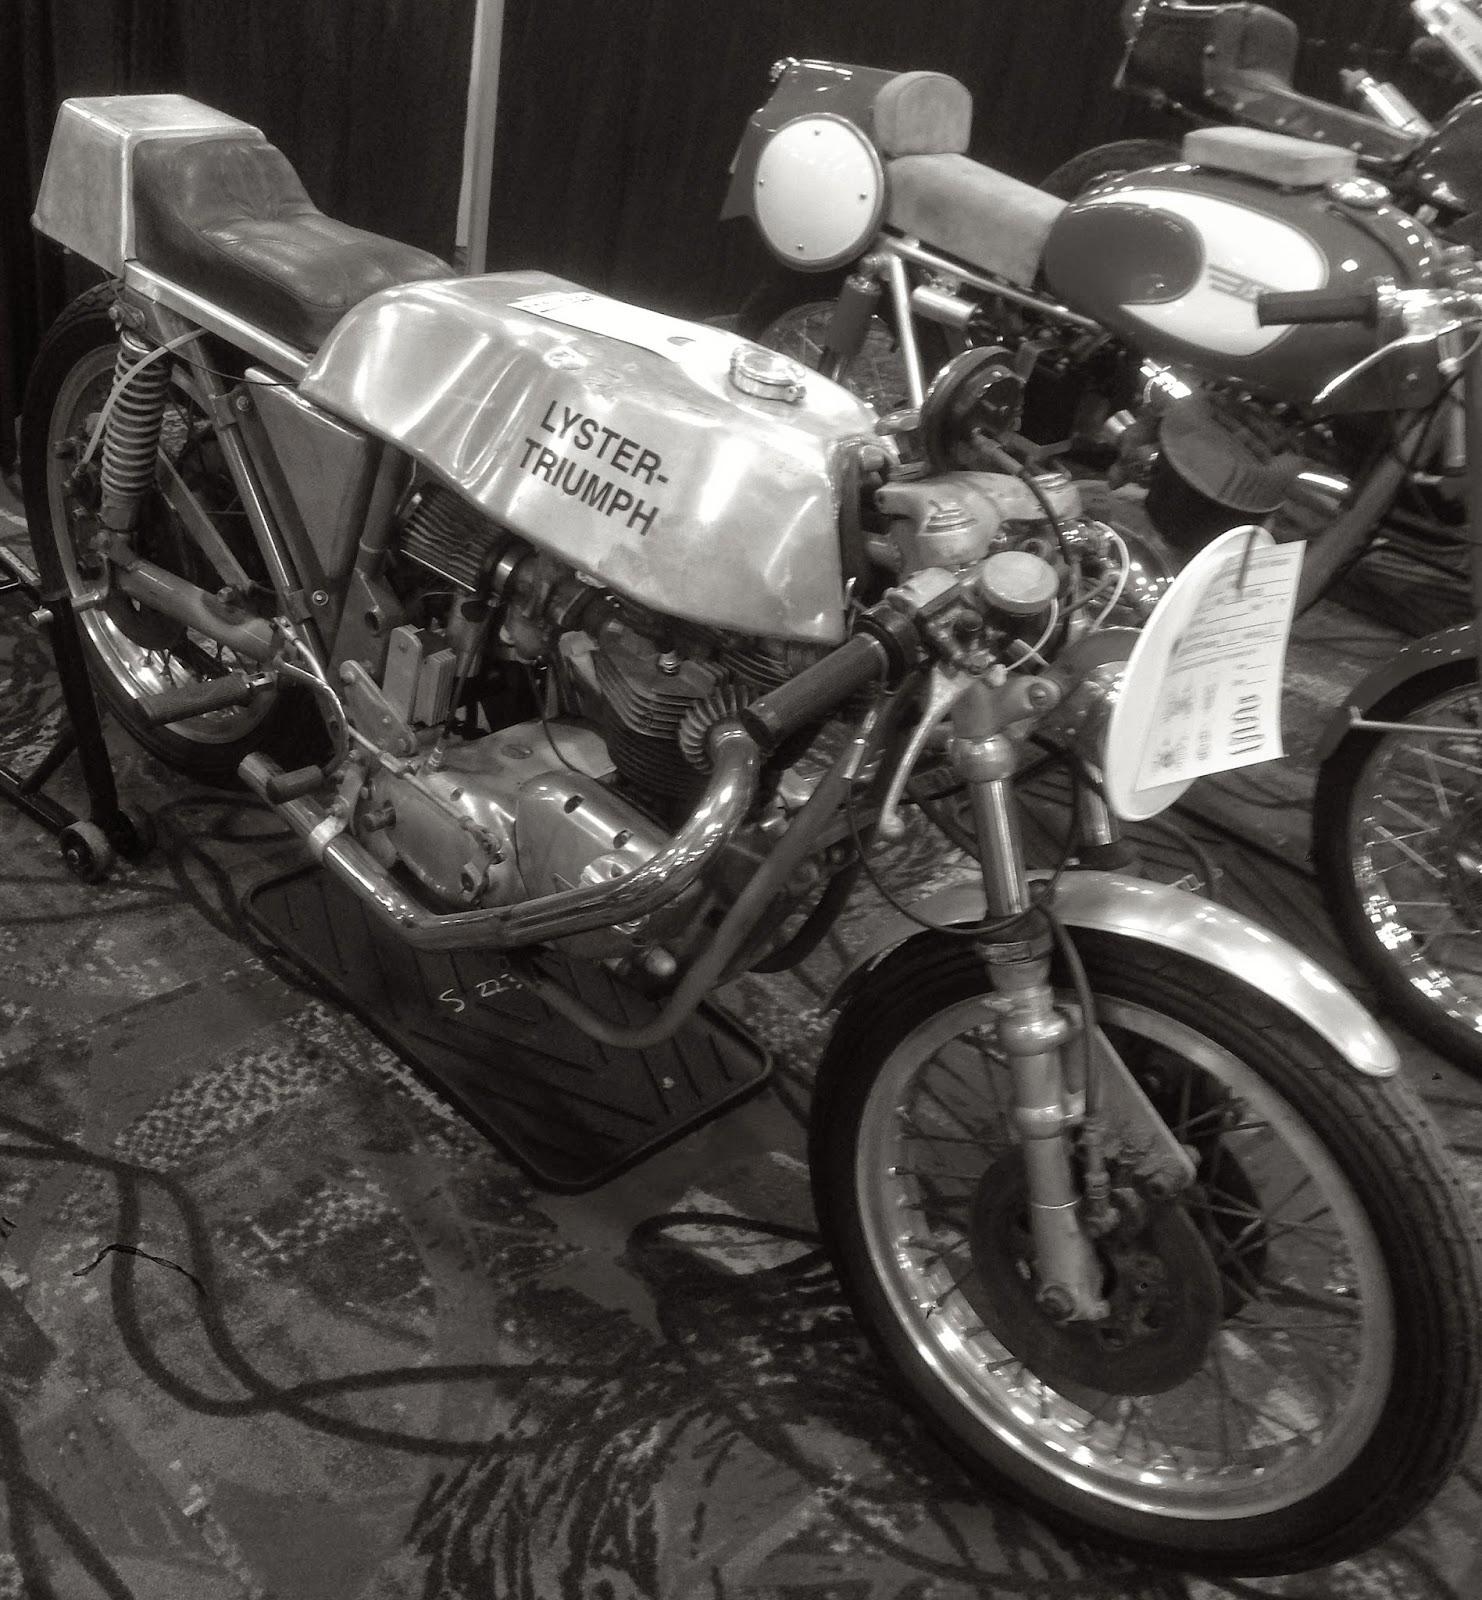 GENUINE TRIUMPH MOTORCYCLES BRADBURY T-SHIRT TIGER ADVENTURE T SHIRT MARL RED